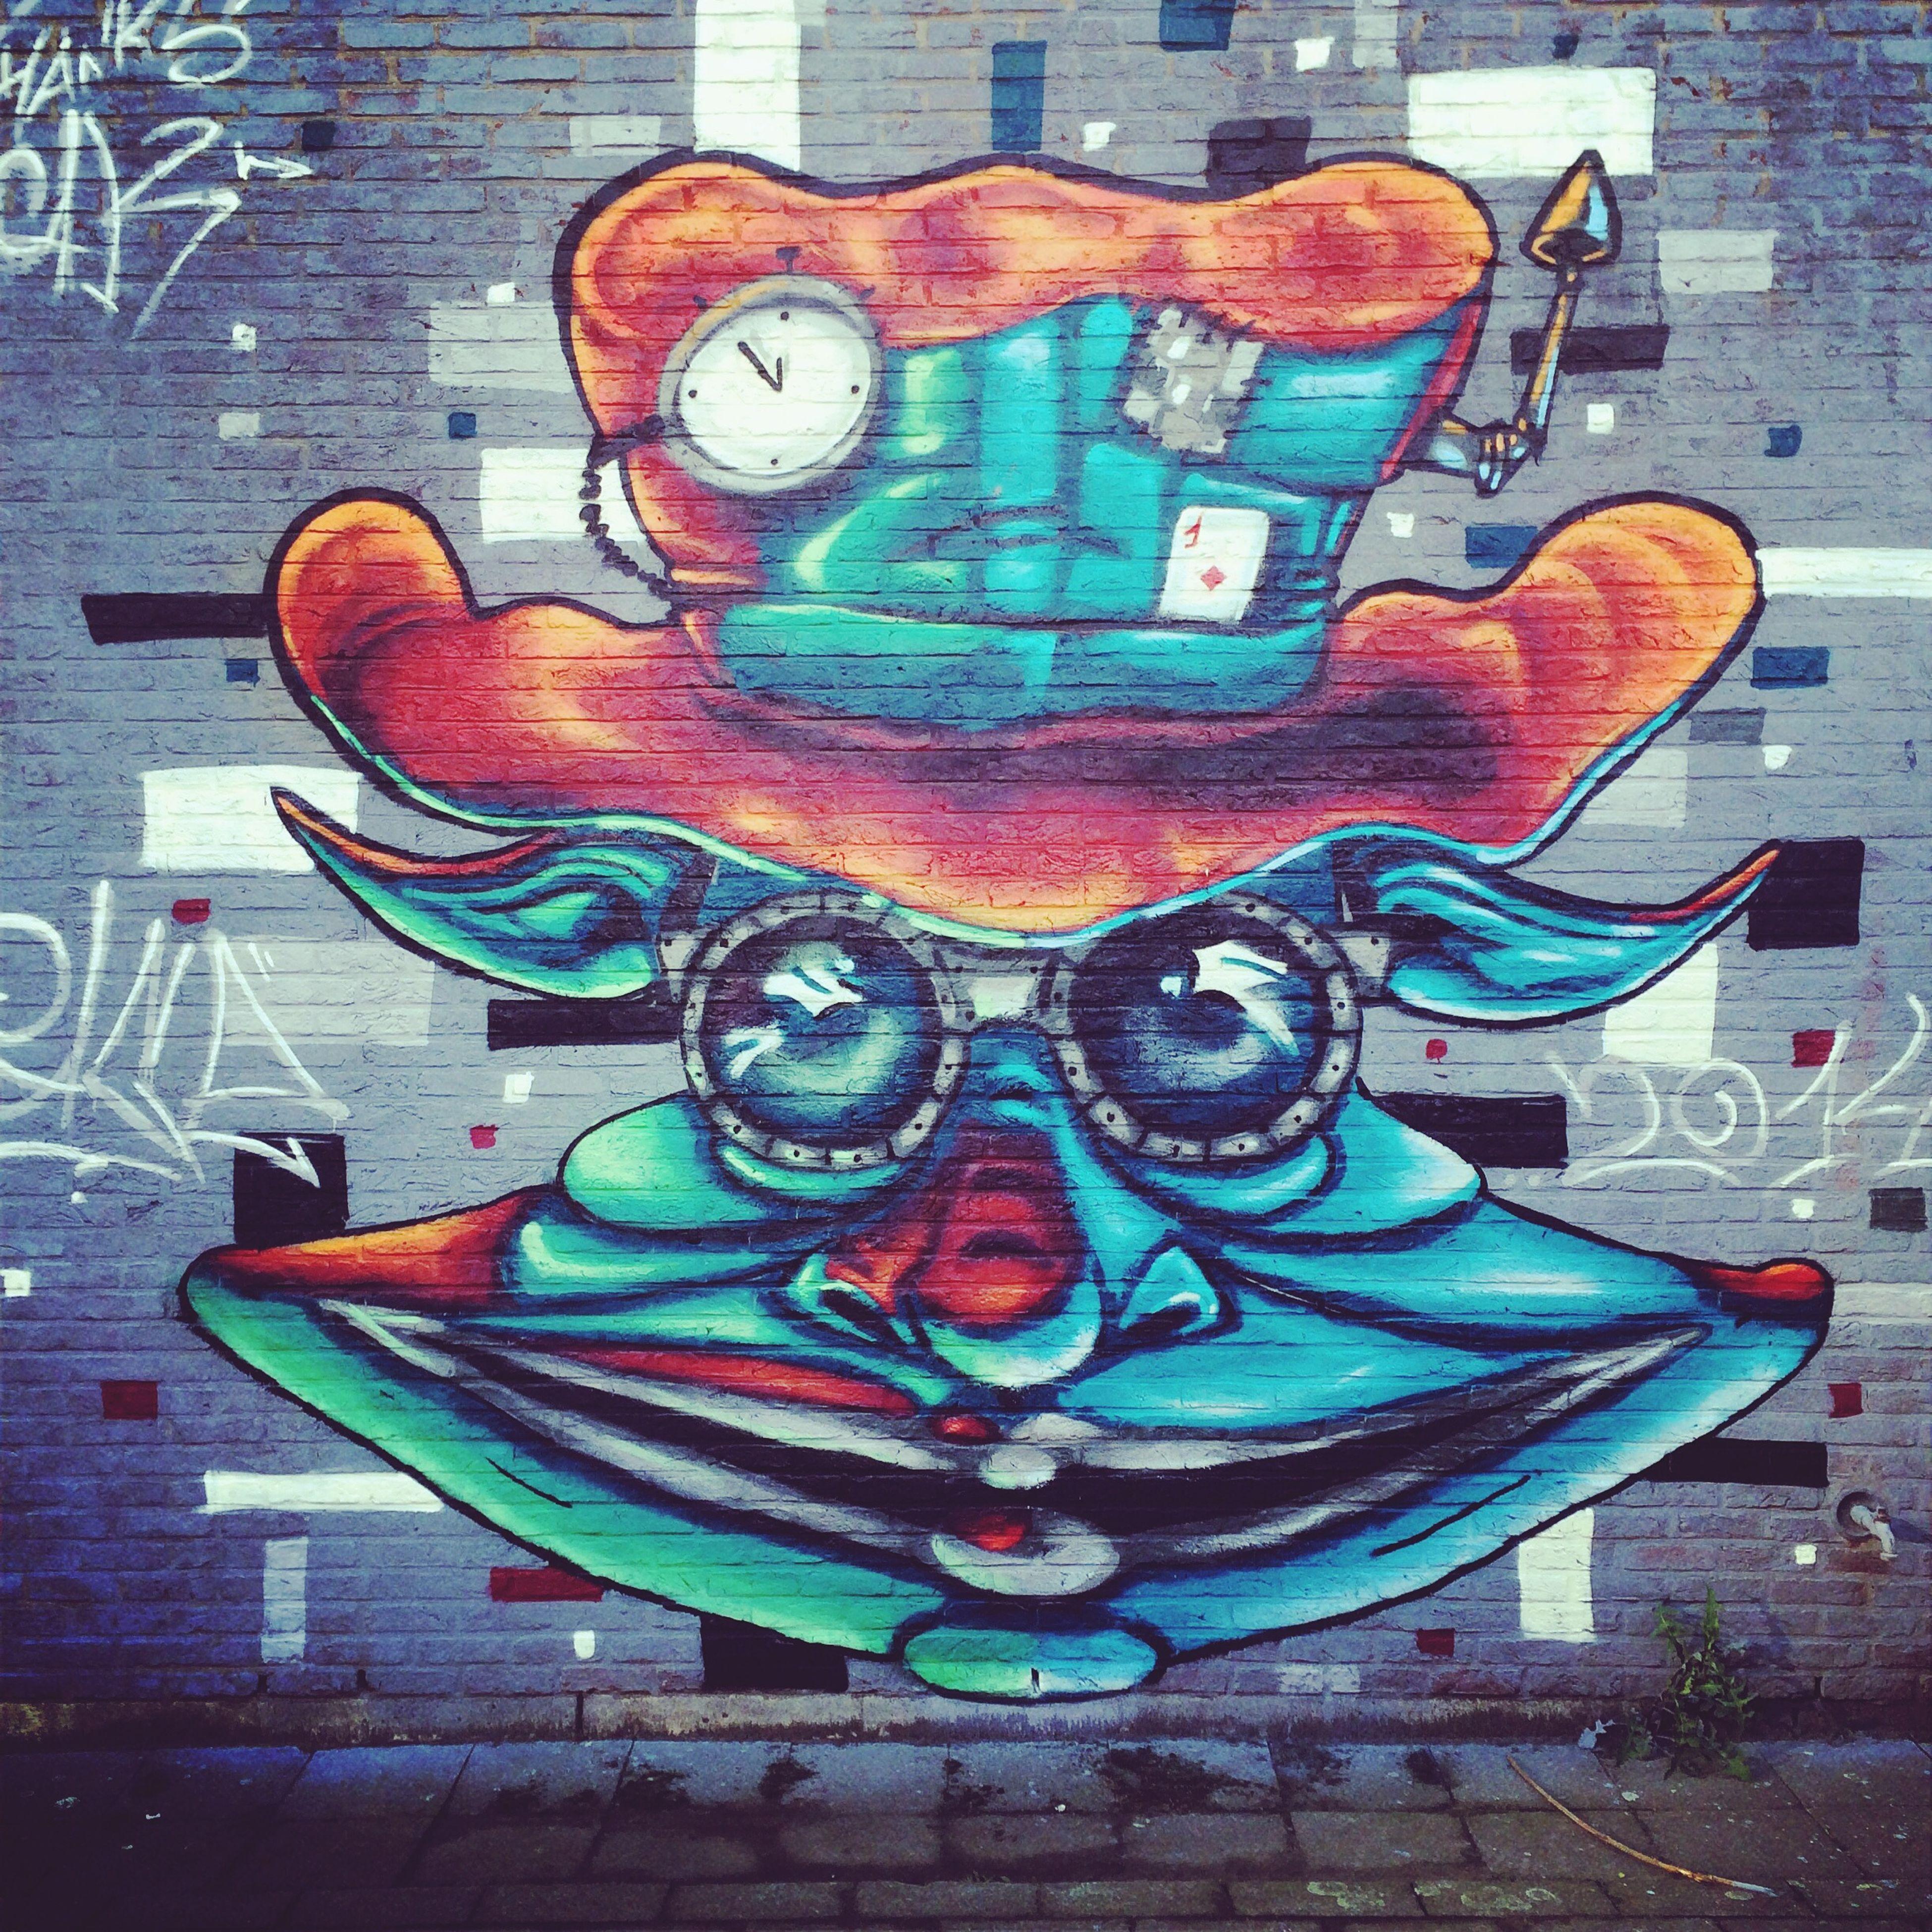 art, art and craft, creativity, human representation, graffiti, multi colored, animal representation, wall - building feature, craft, sculpture, built structure, design, architecture, mural, street art, no people, statue, pattern